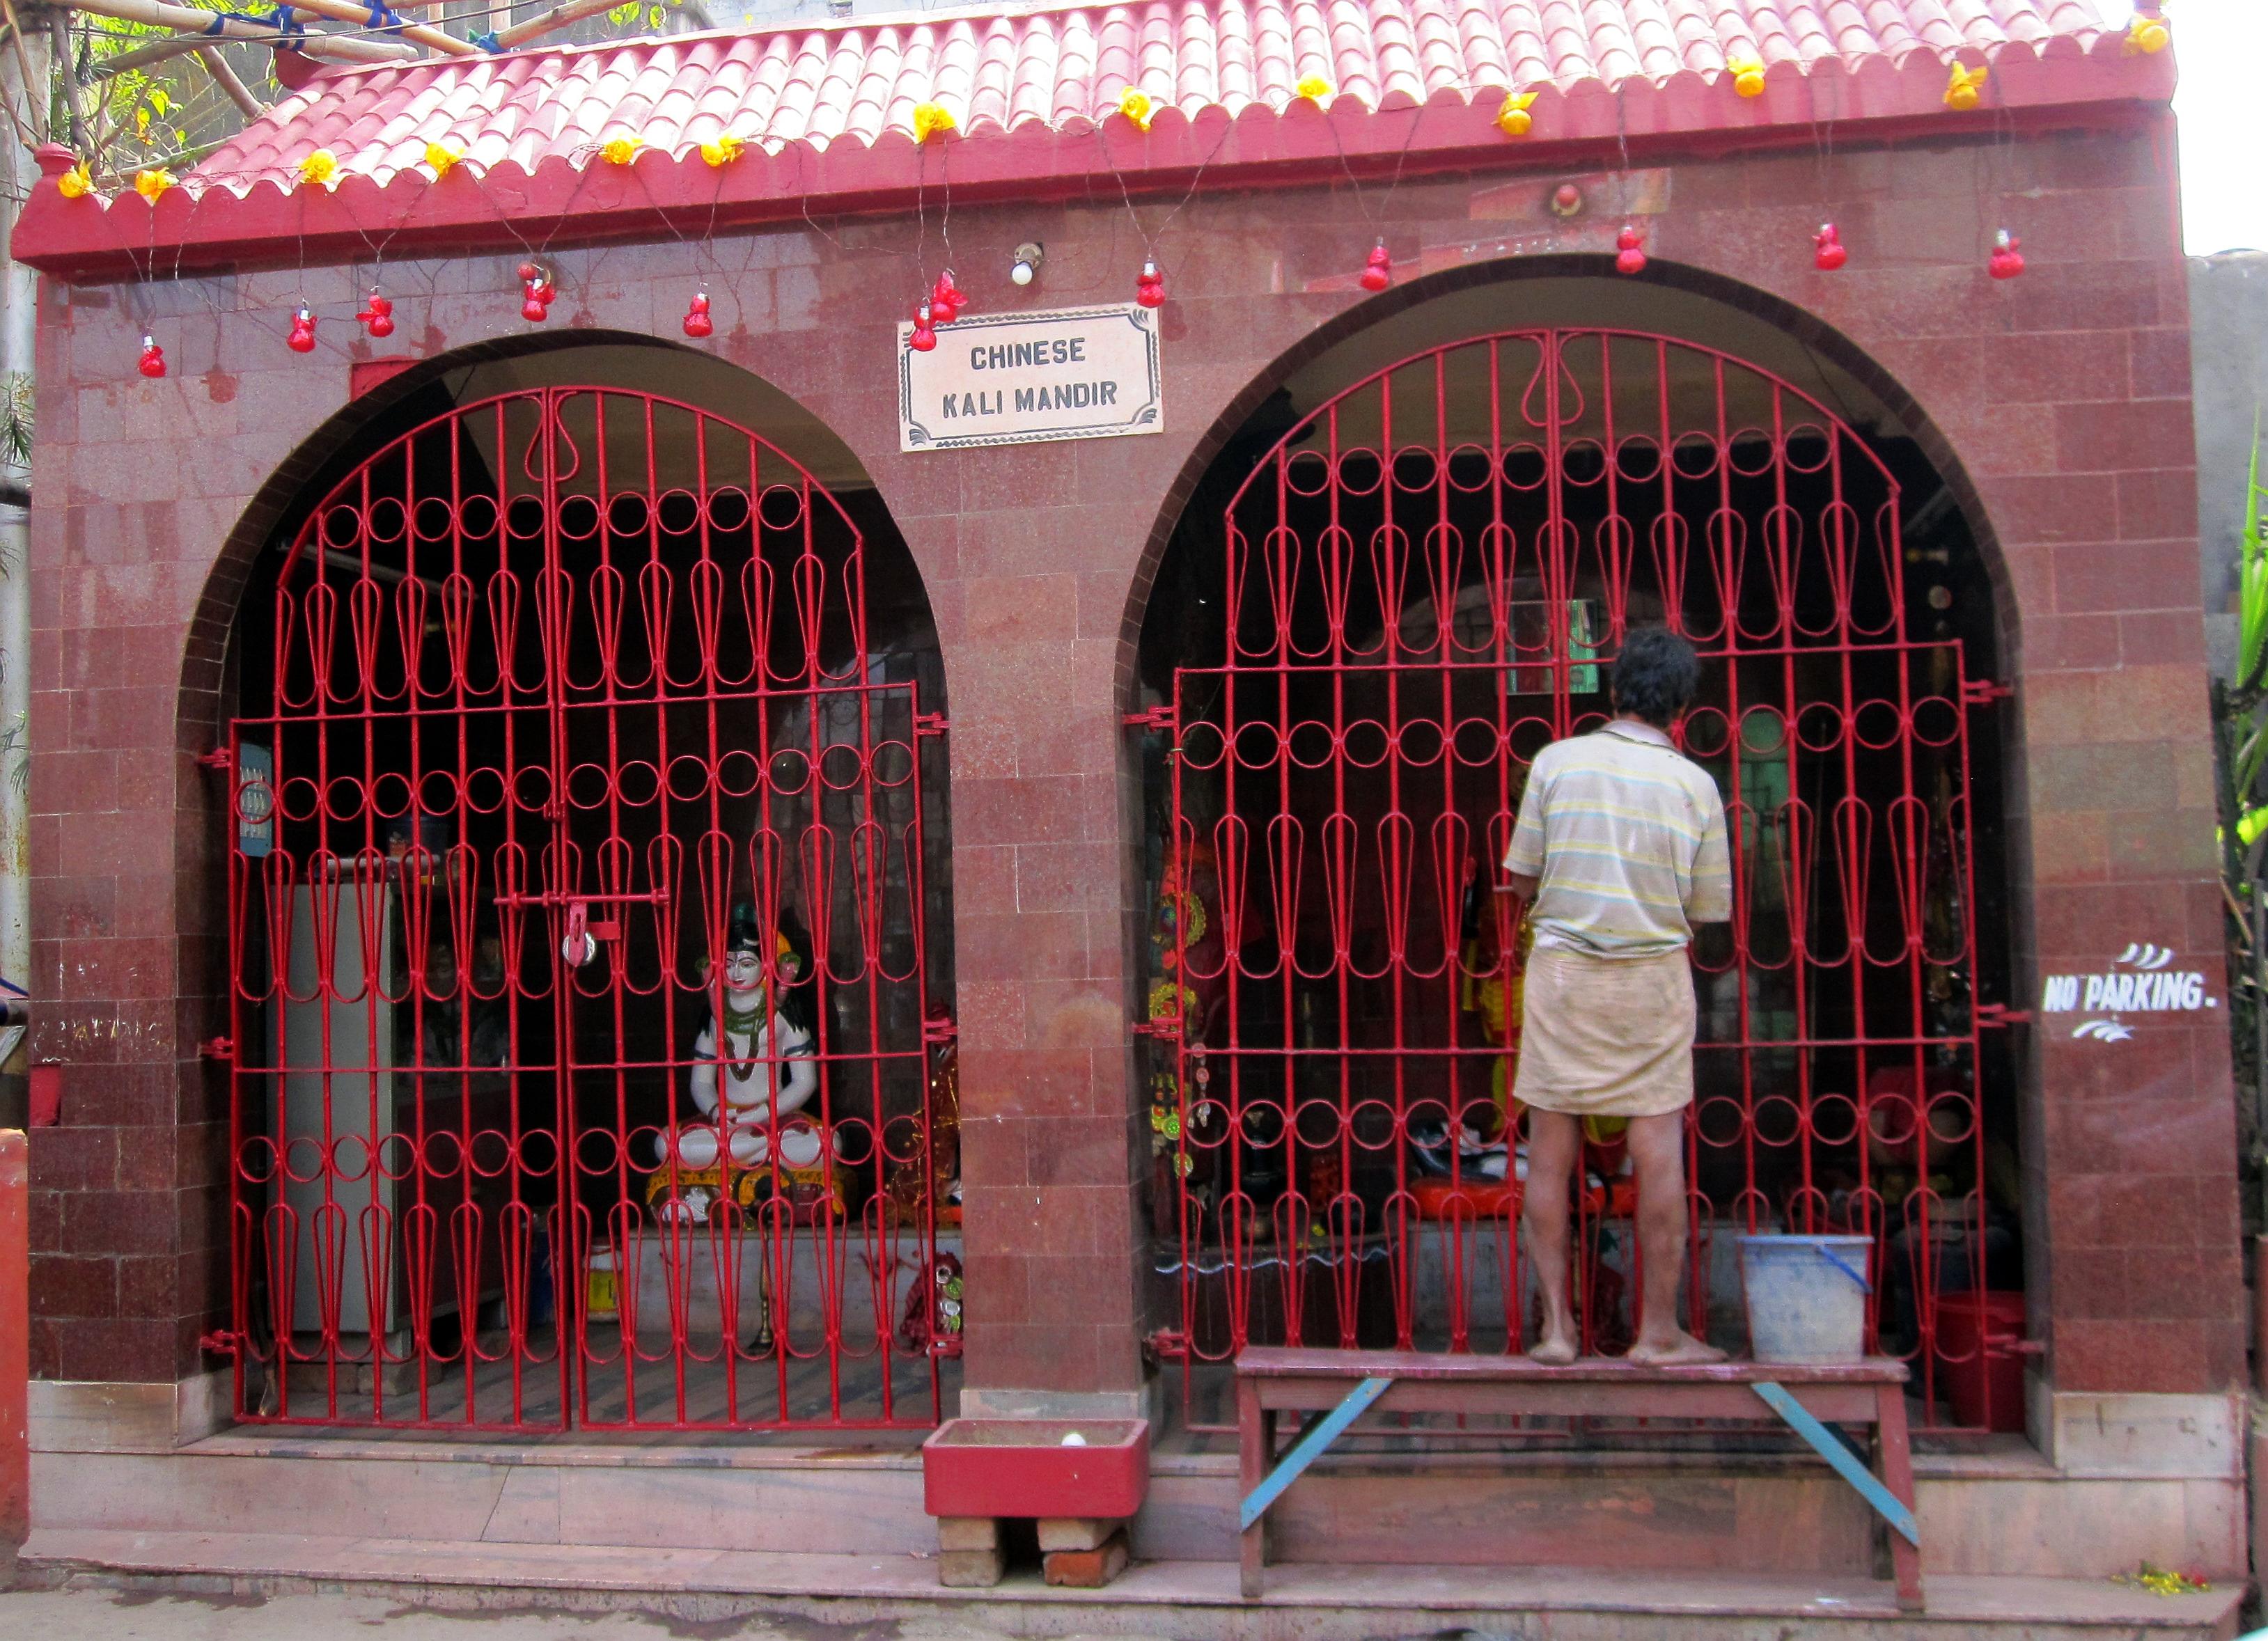 Kinesiskt Kali tempel. ©Zac O'Yeah